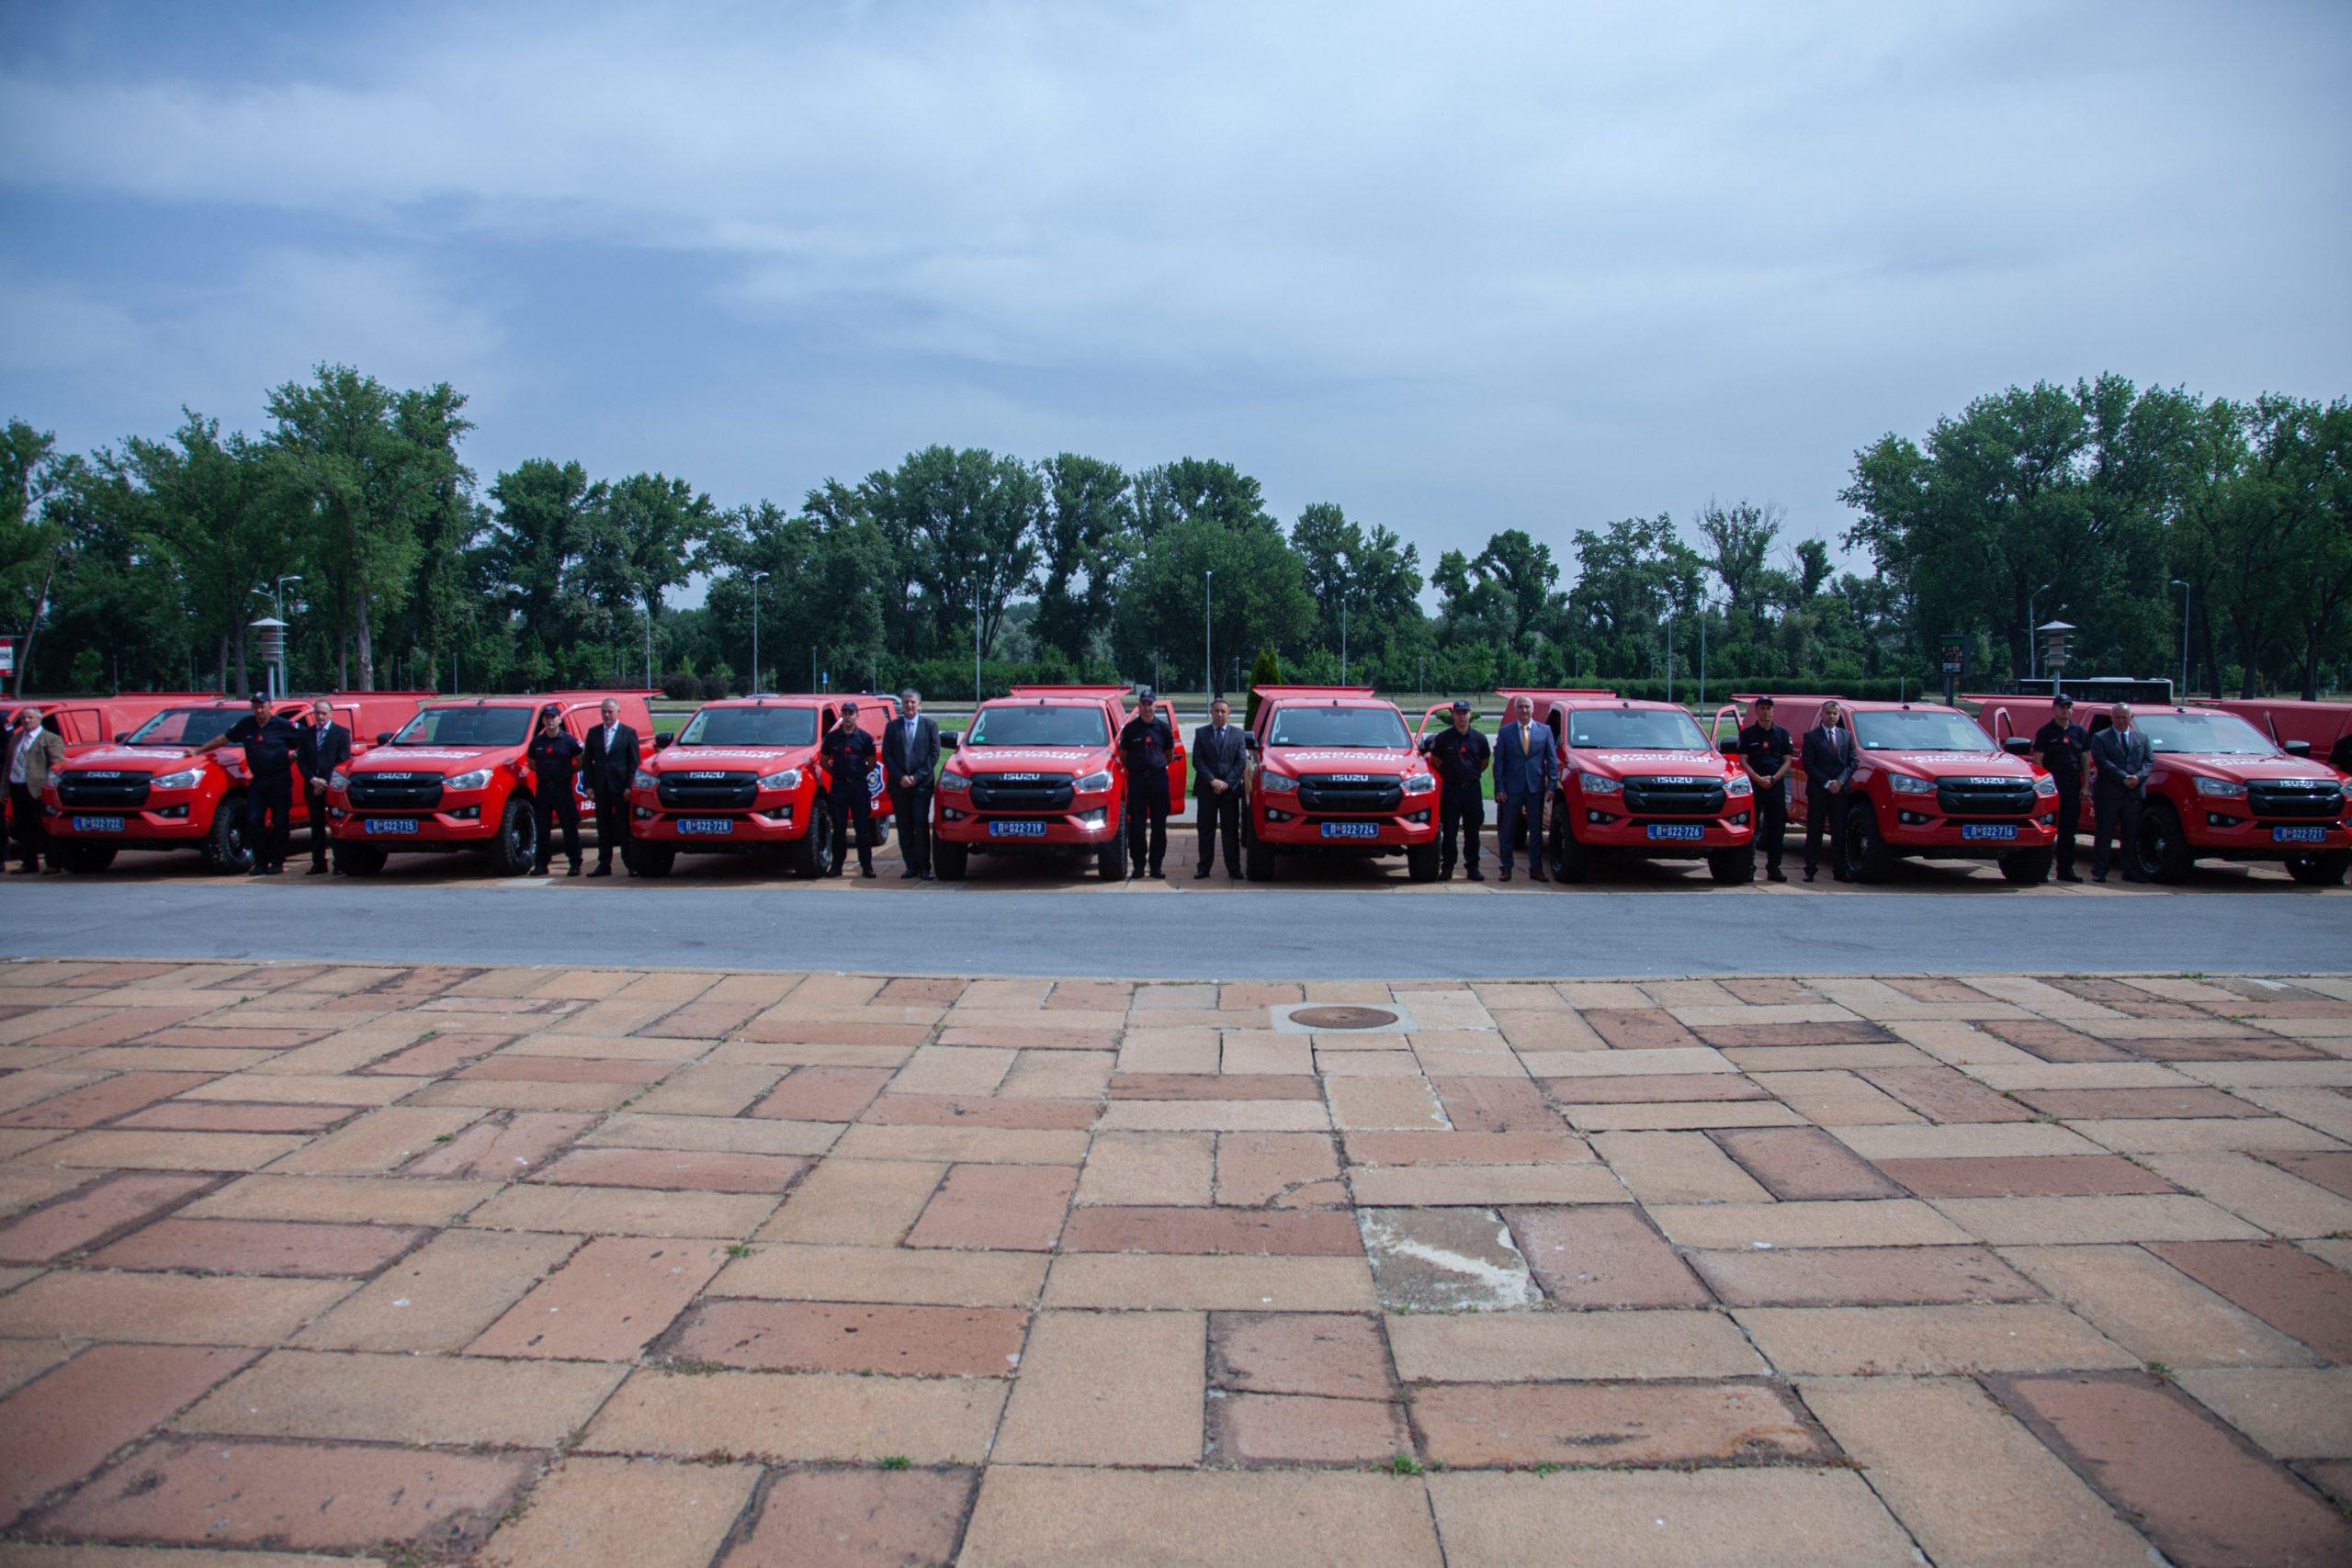 EU obezbedila 27 vozila za gašenje šumskih požara 2